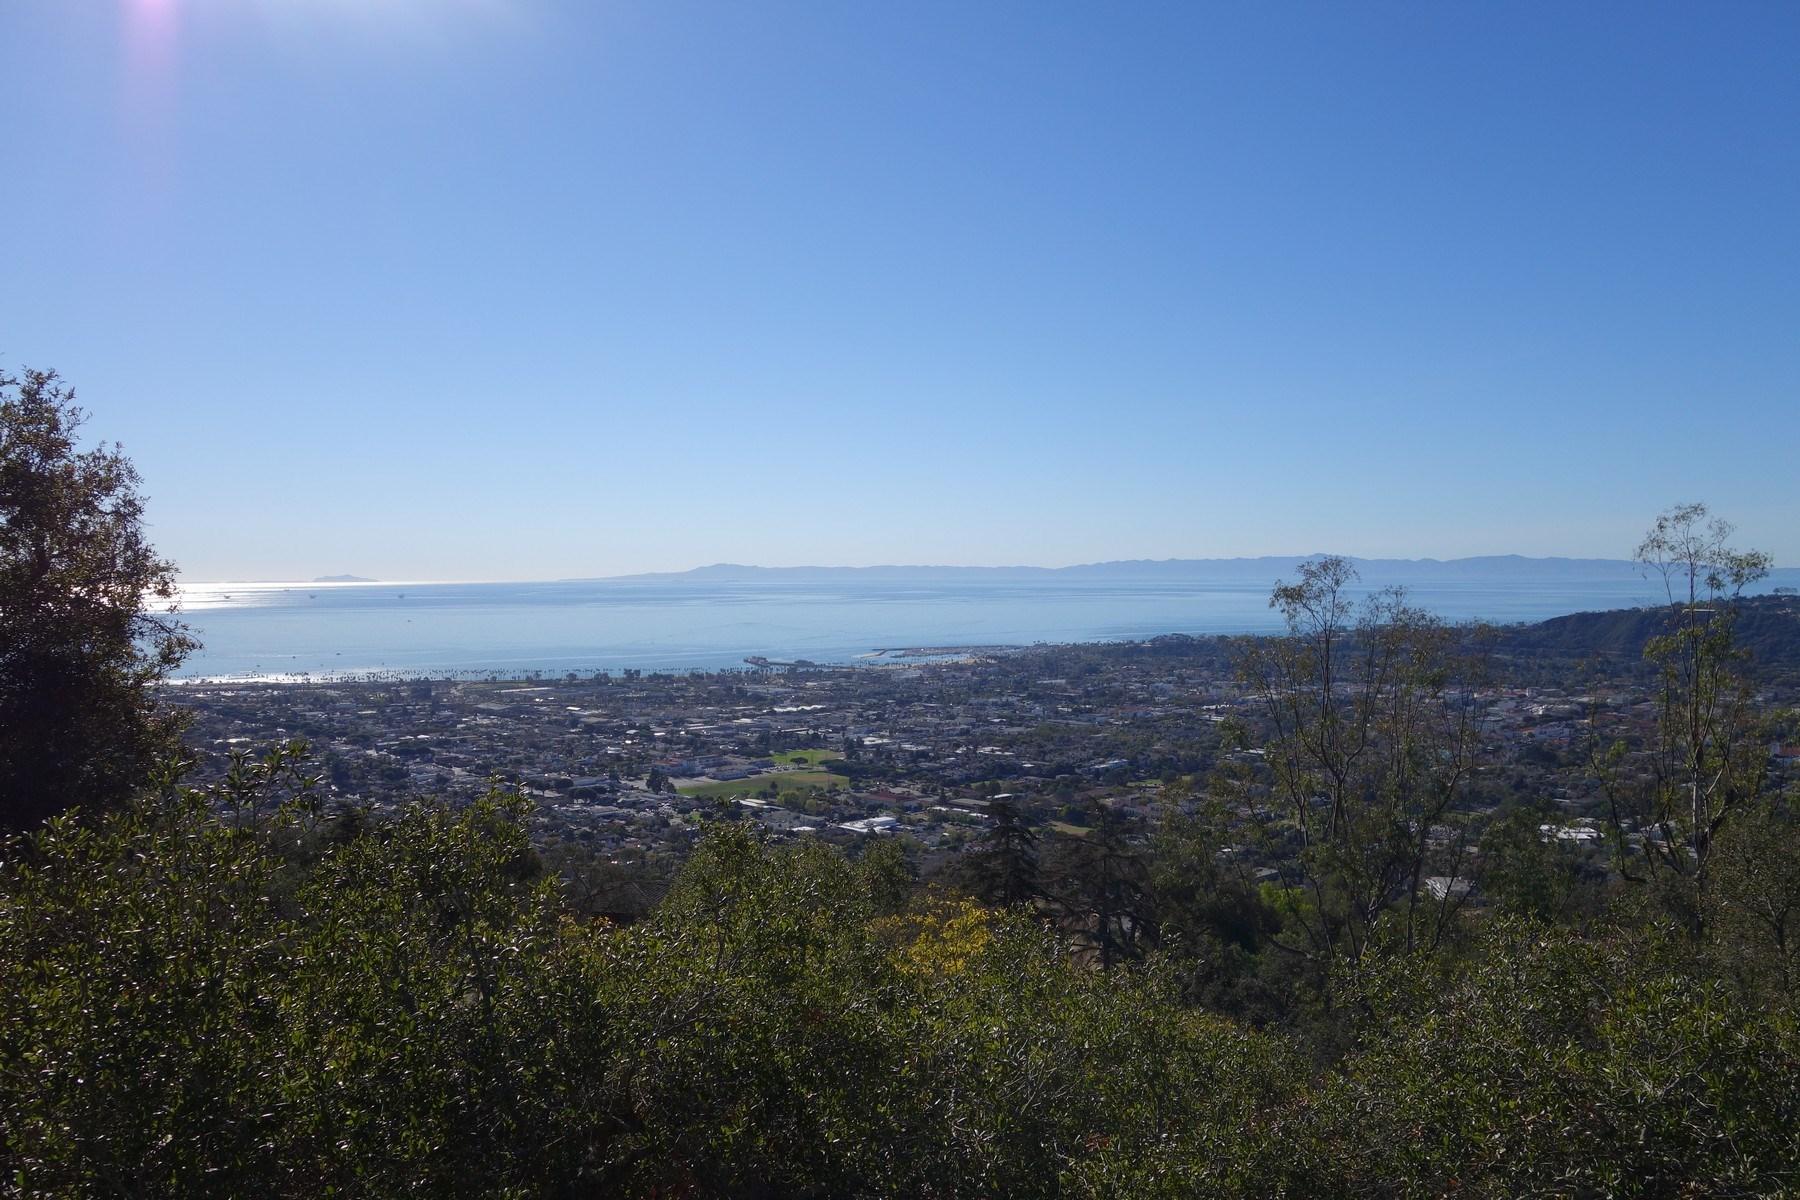 Single Family Home for Sale at Forever Views Riviera, Santa Barbara, California 93103 United States